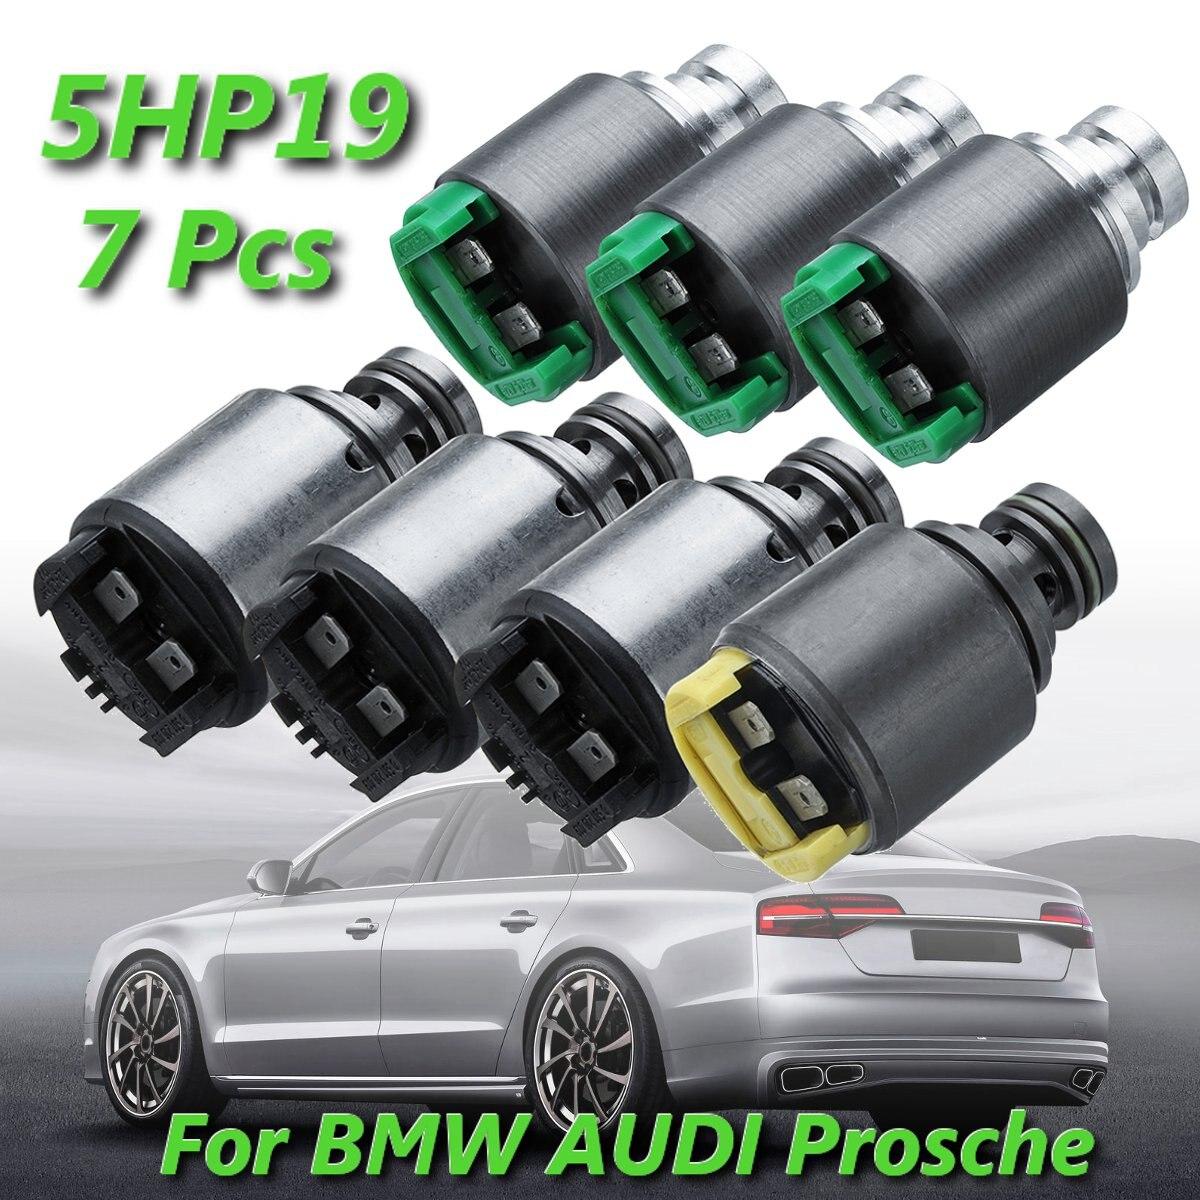 For BMW for AUDI A6  A8 S4 Prosche 911 BOXSTER 1060 298 033 7 Pcs 5HP19 Pressure Regulator Transmission Solenoids KitFor BMW for AUDI A6  A8 S4 Prosche 911 BOXSTER 1060 298 033 7 Pcs 5HP19 Pressure Regulator Transmission Solenoids Kit